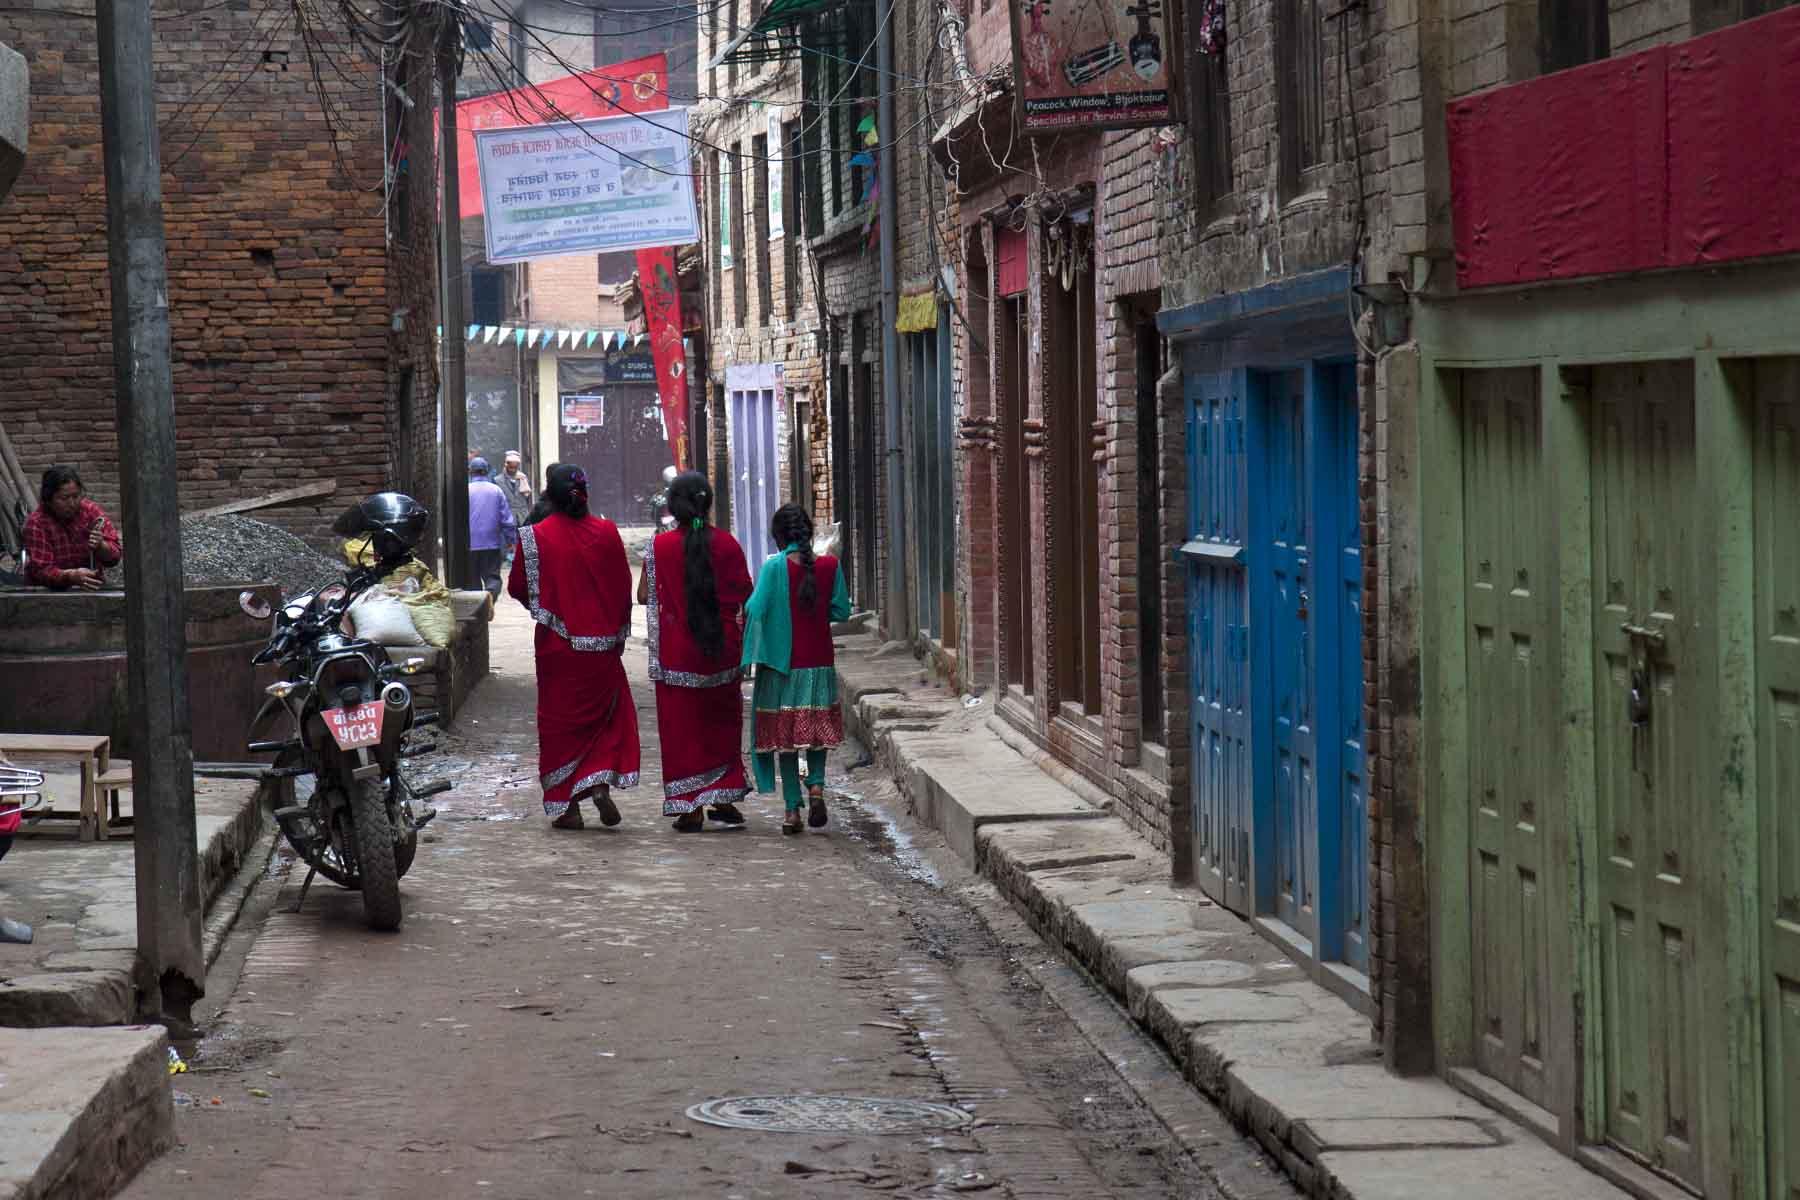 Morning street, New Year's Day, Bhaktapur, Nepal